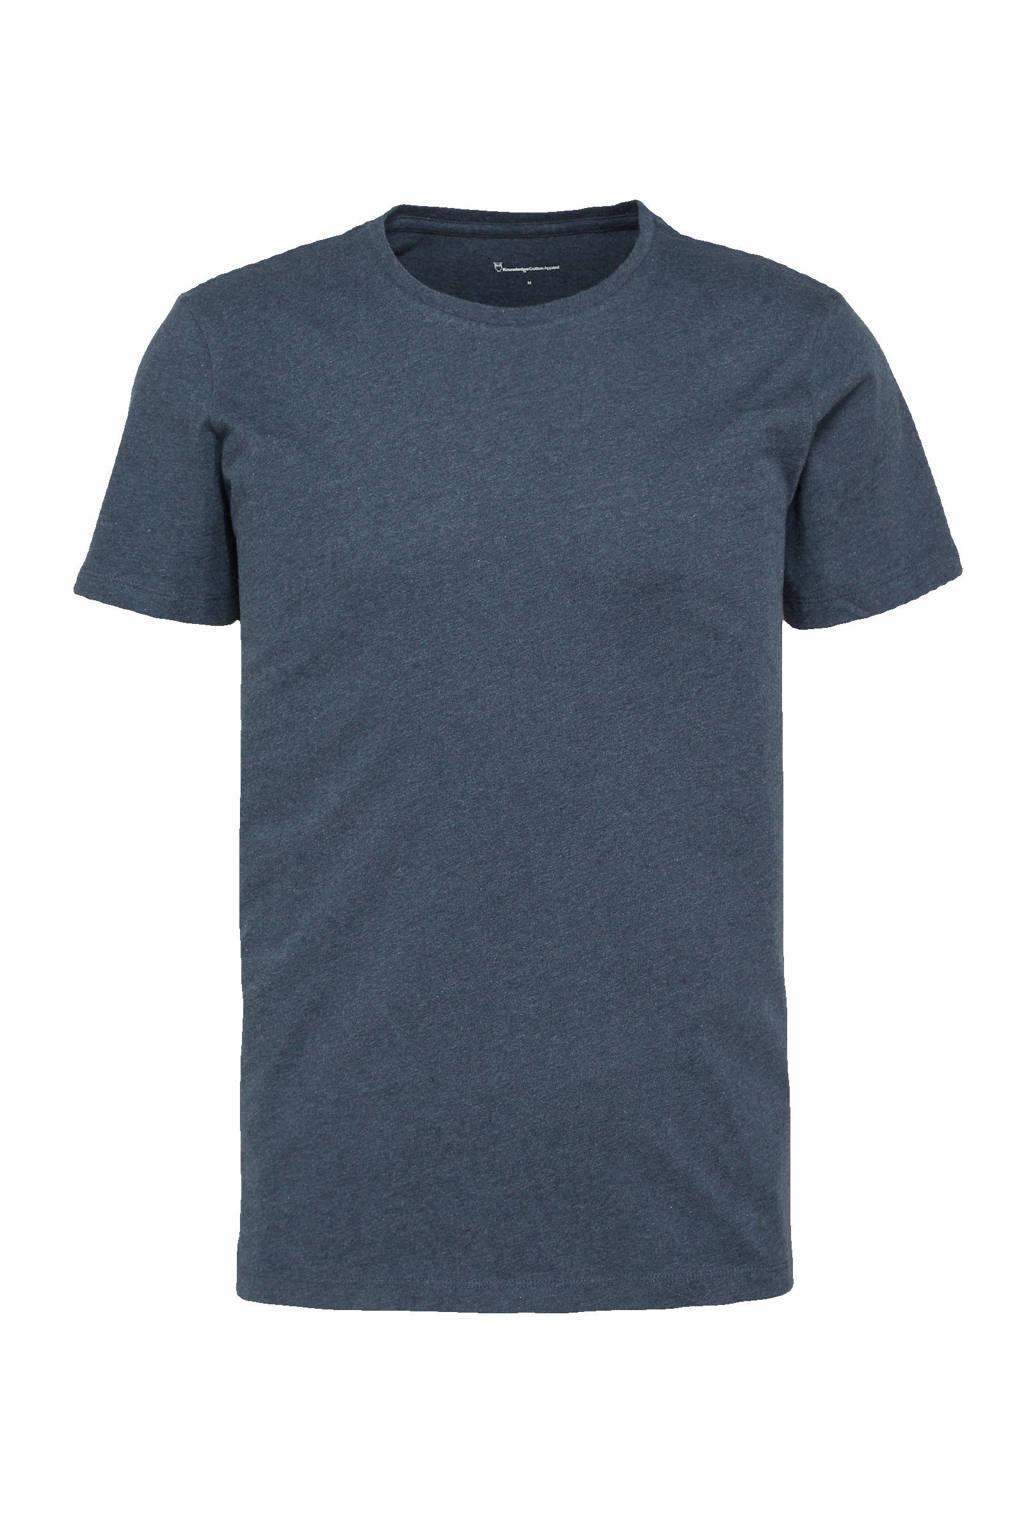 Knowledge Cotton Apparel T-shirt ALDER donkerblauw melange, Donkerblauw melange